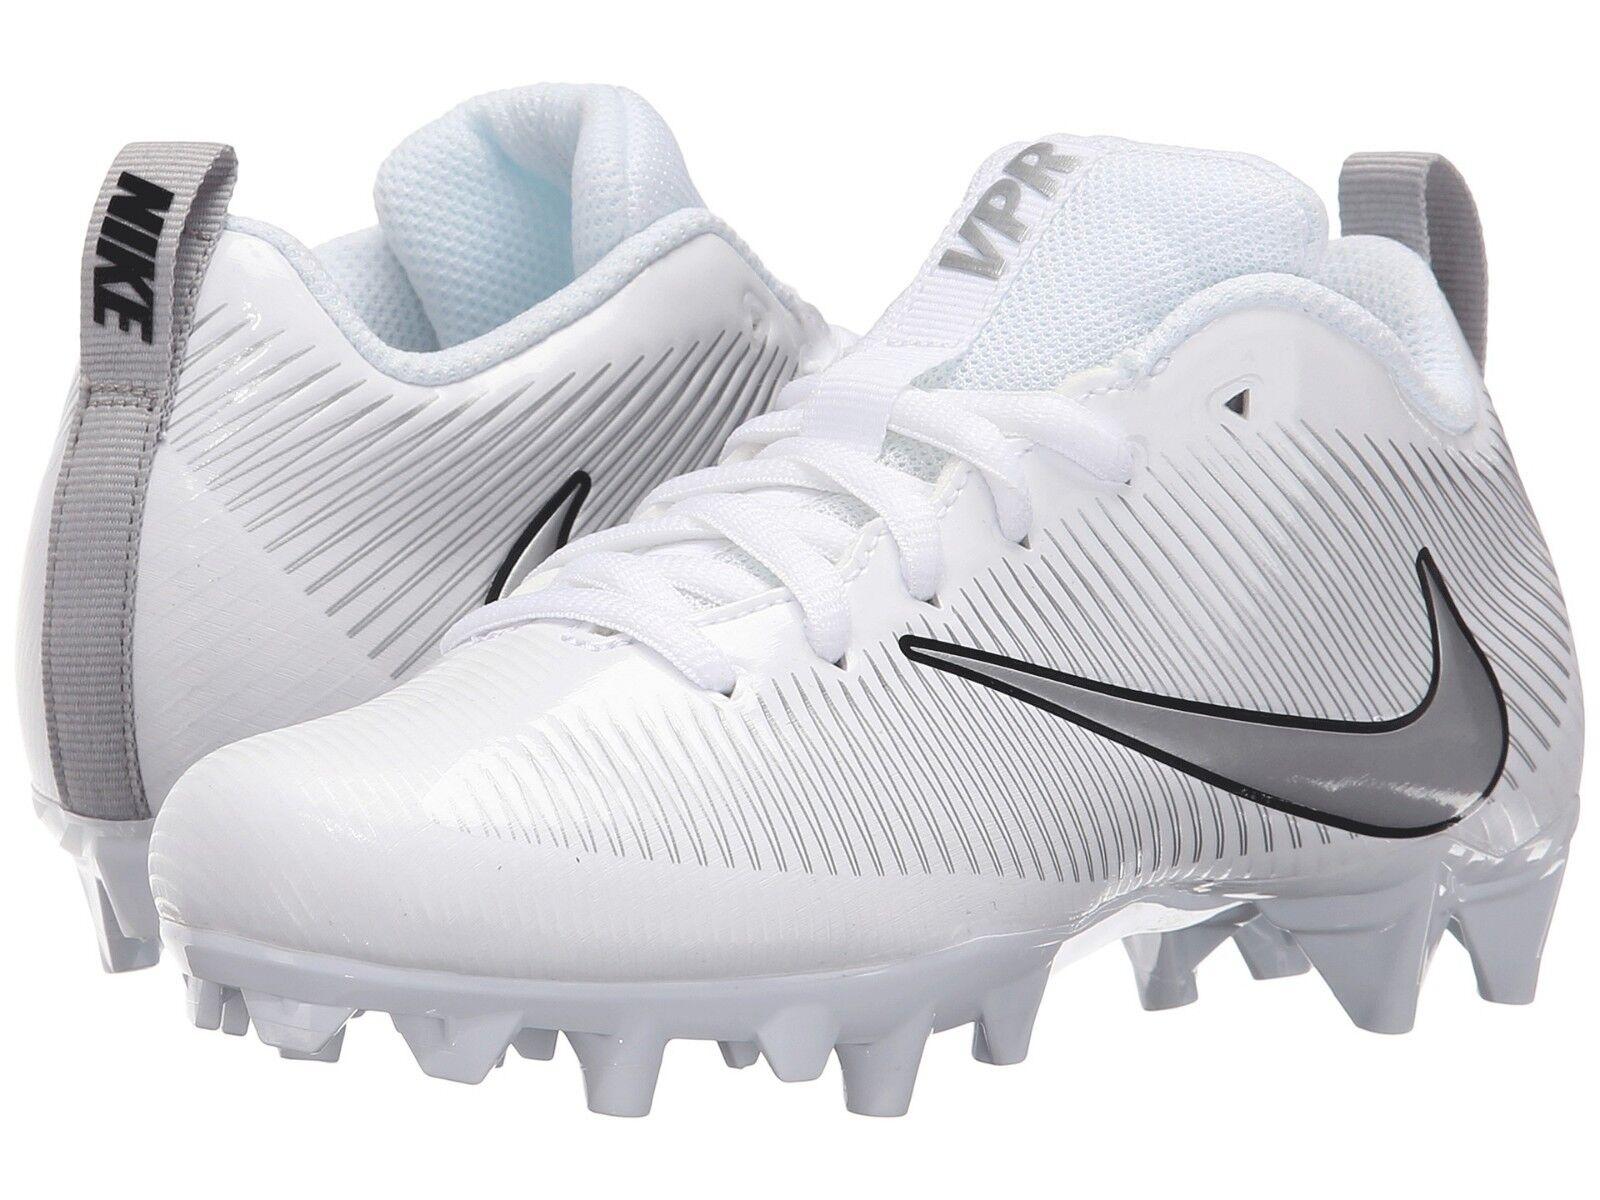 Nike Men's Vapor Strike 5 TD White Football Cleat Shoes